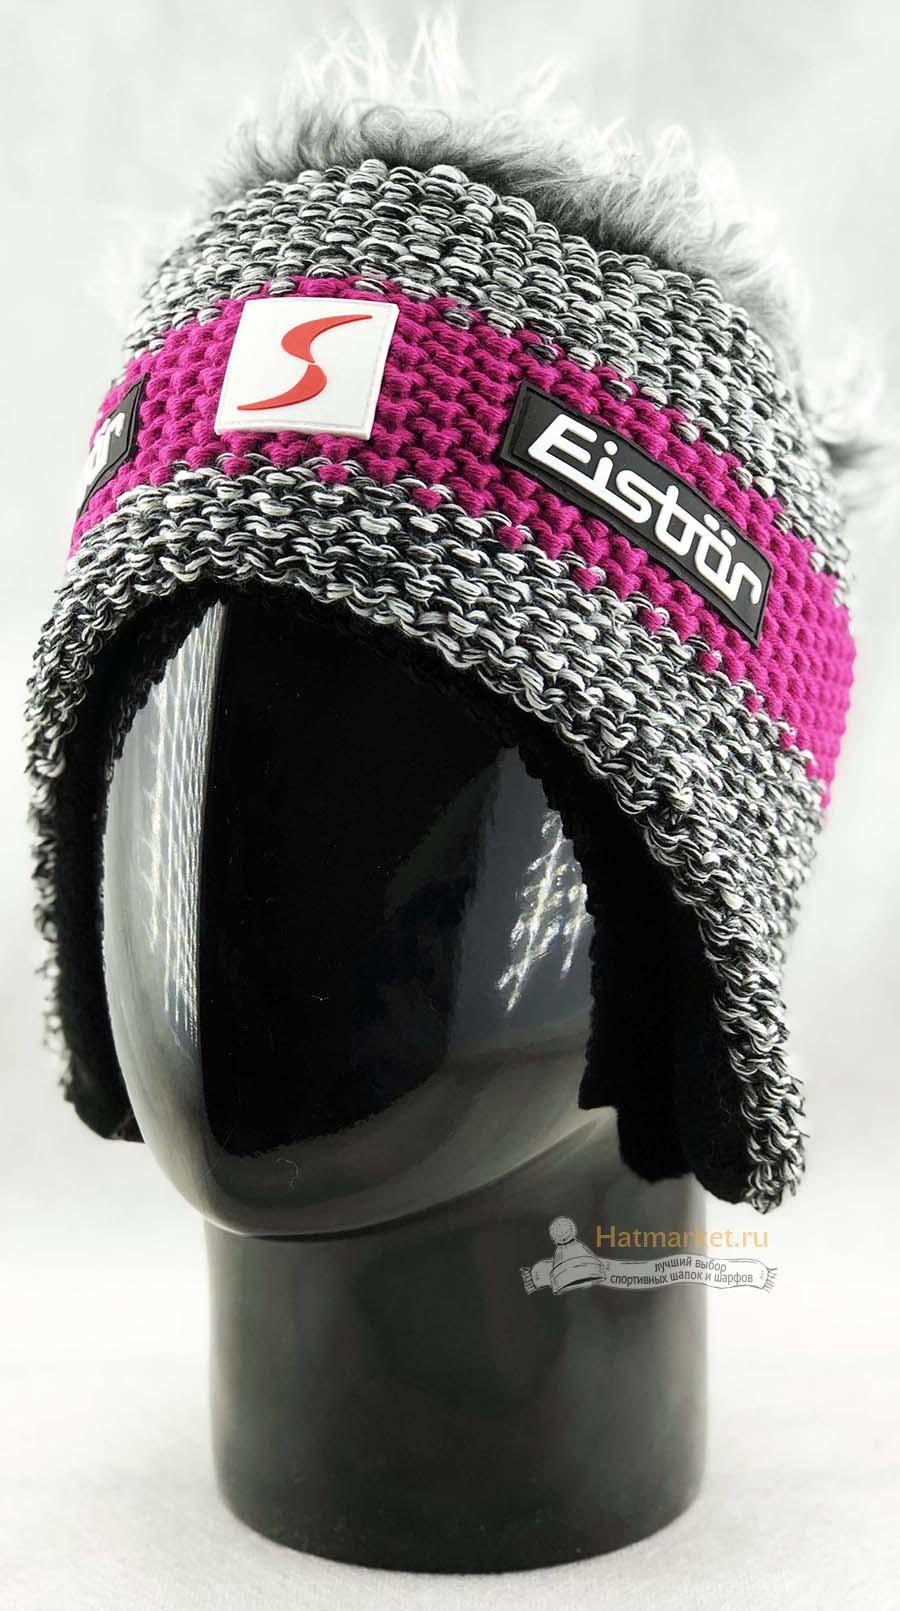 Eisbar Шапка с волосами Eisbar Styler Cocker SP 409 Фото_03.10.2018__18_33_58.jpg